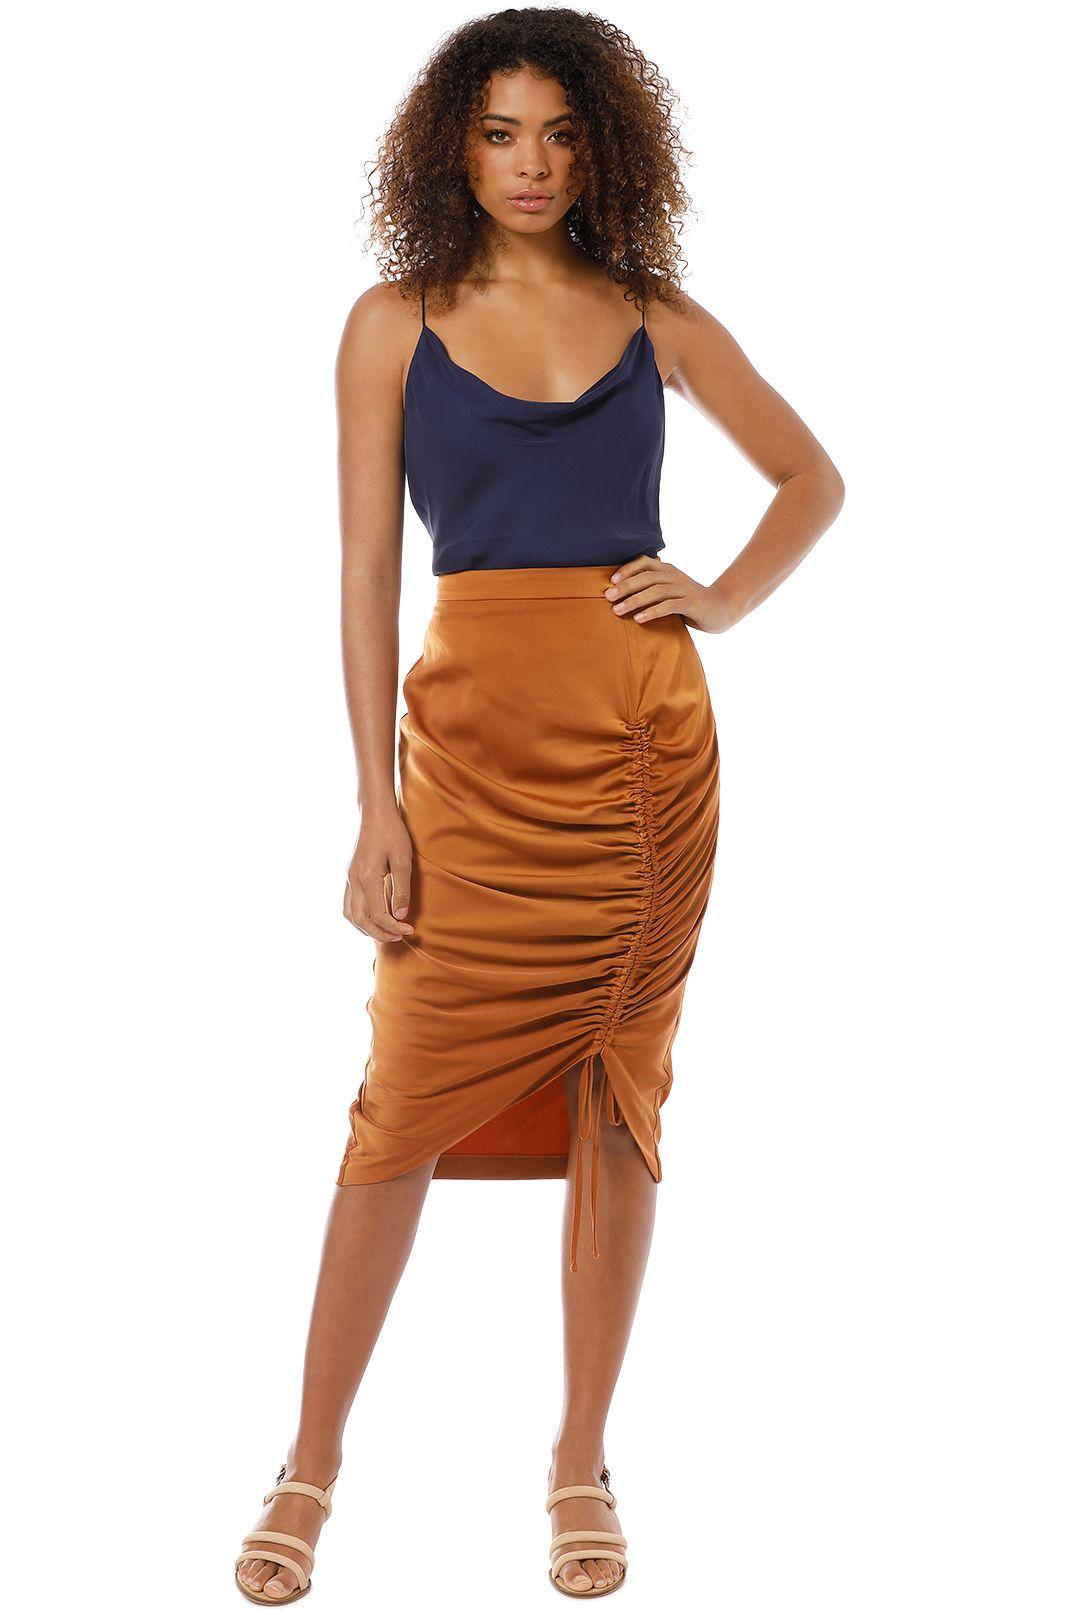 Friend of Audrey - Sienna Drawstring Midi Skirt - Tan - Front